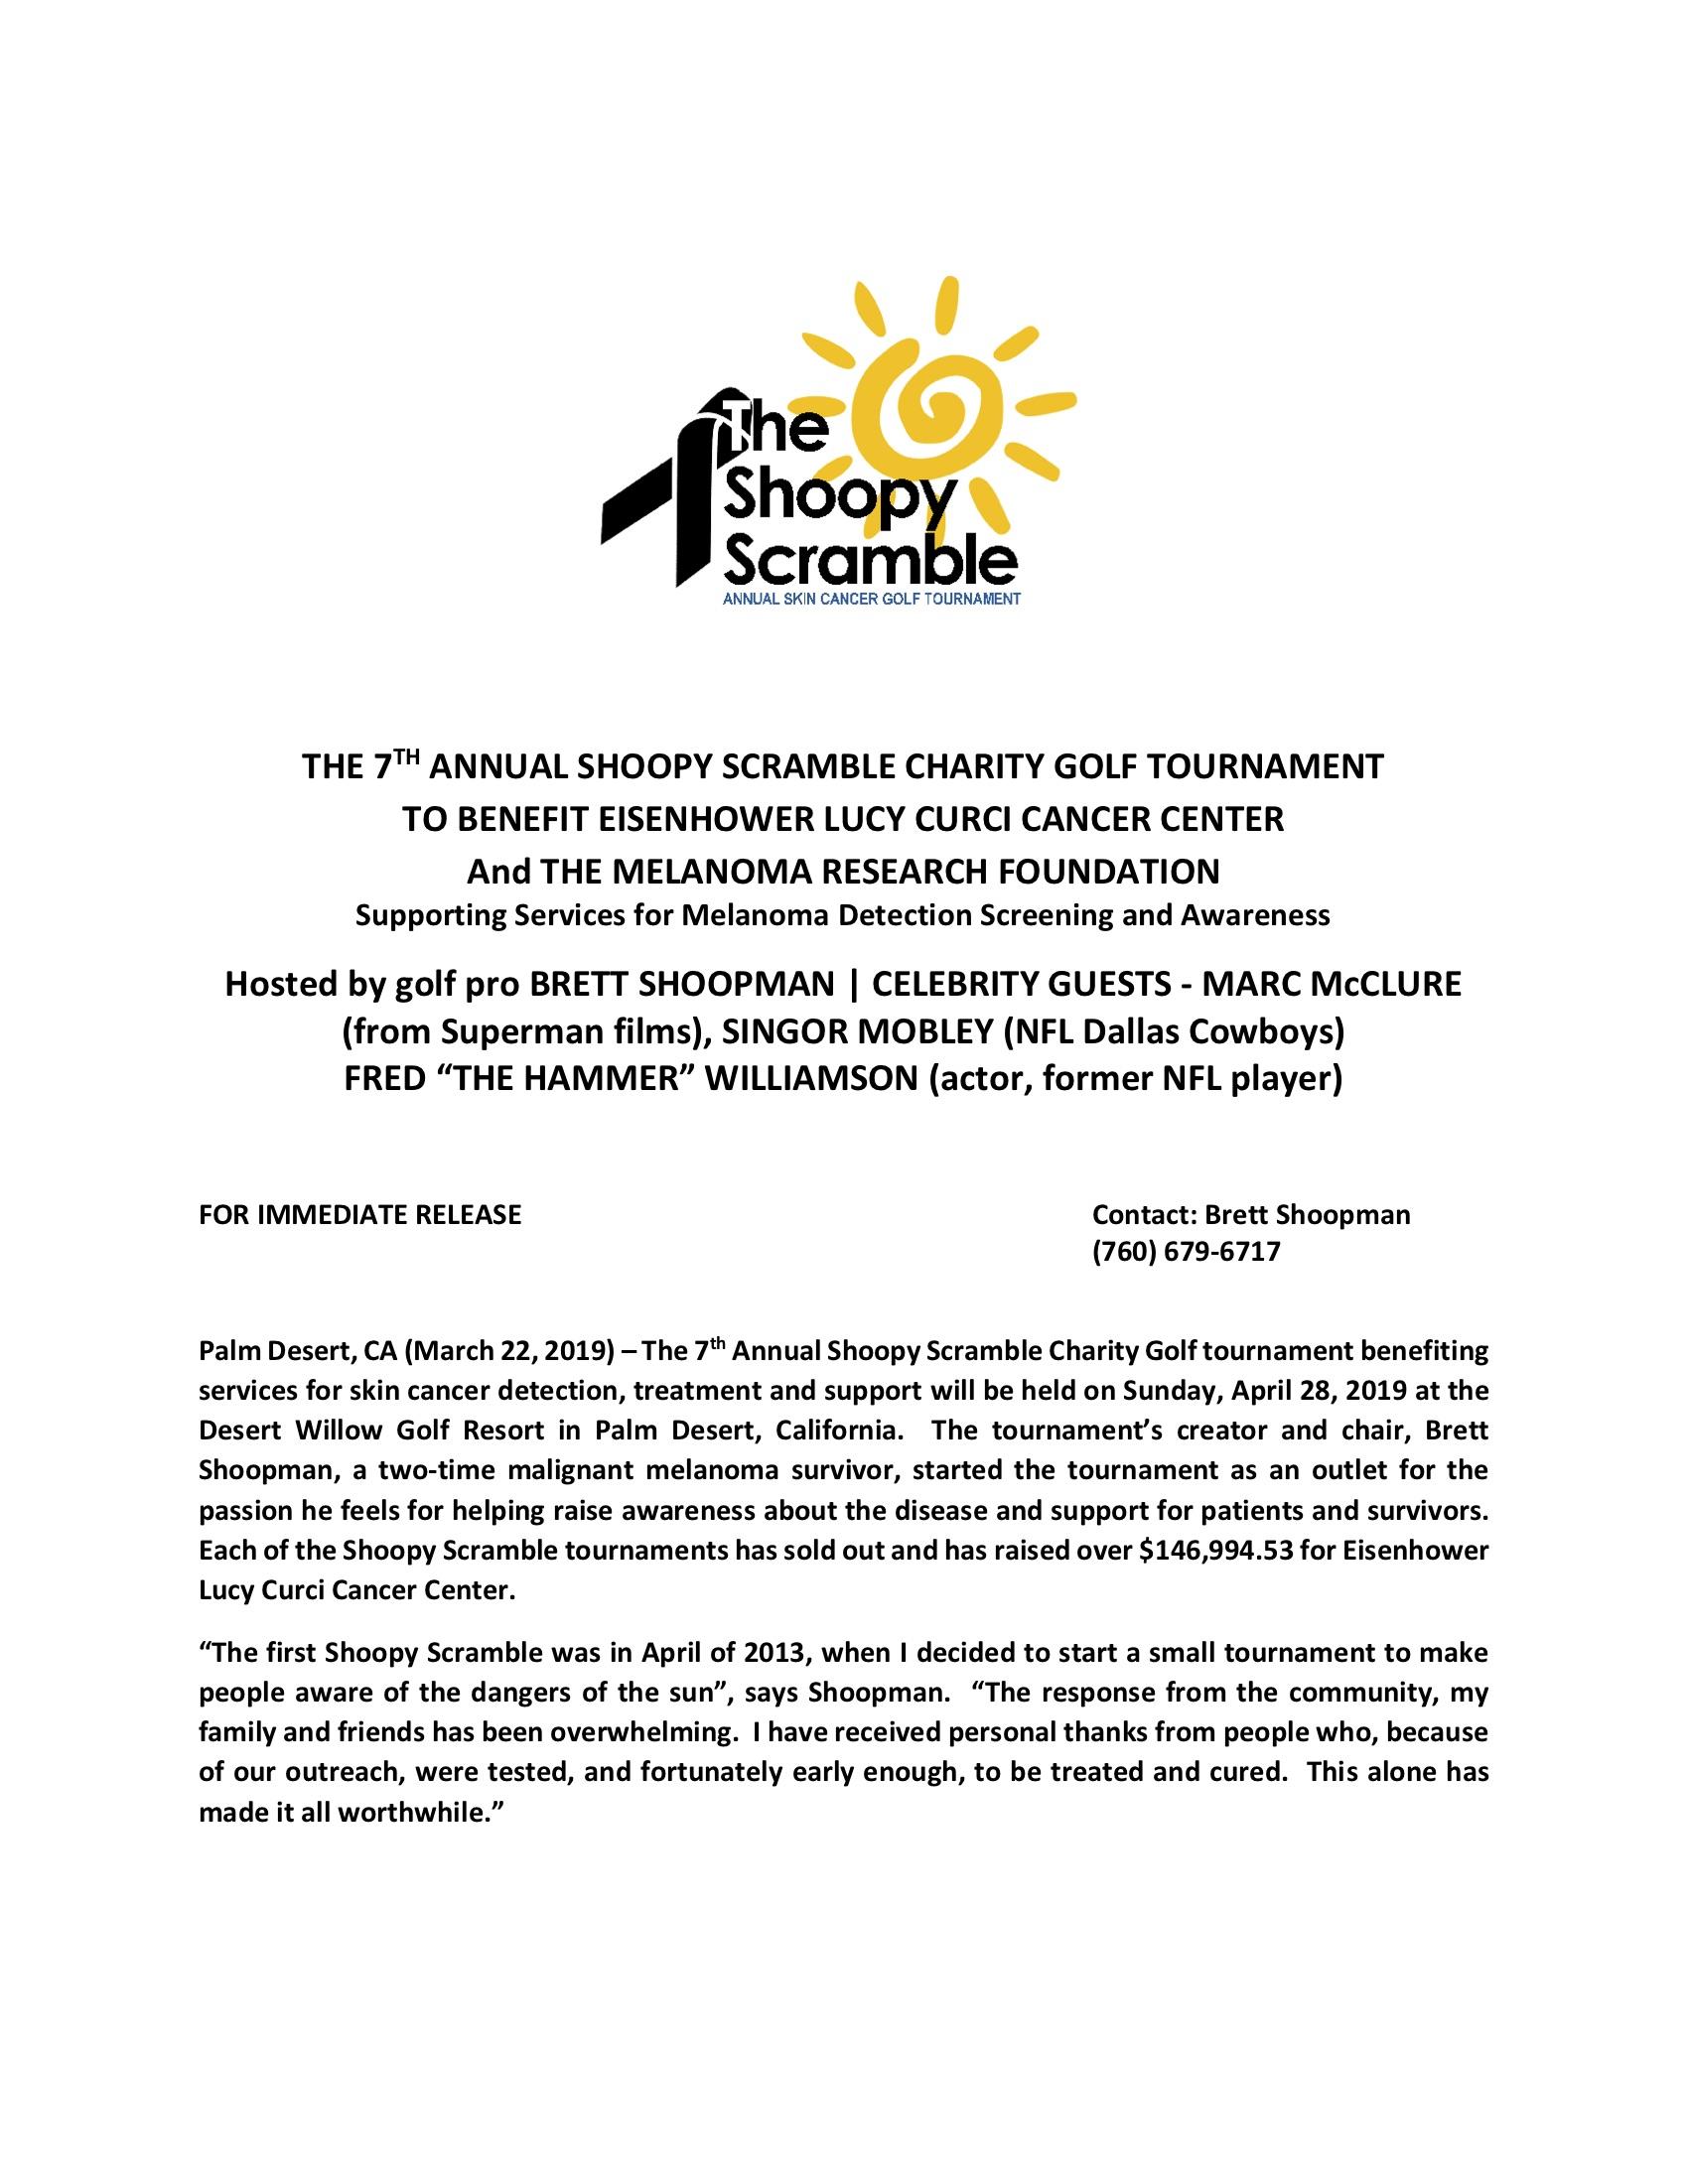 SHOOPY SCRAMBLE Press Release 2019 Final 4-2